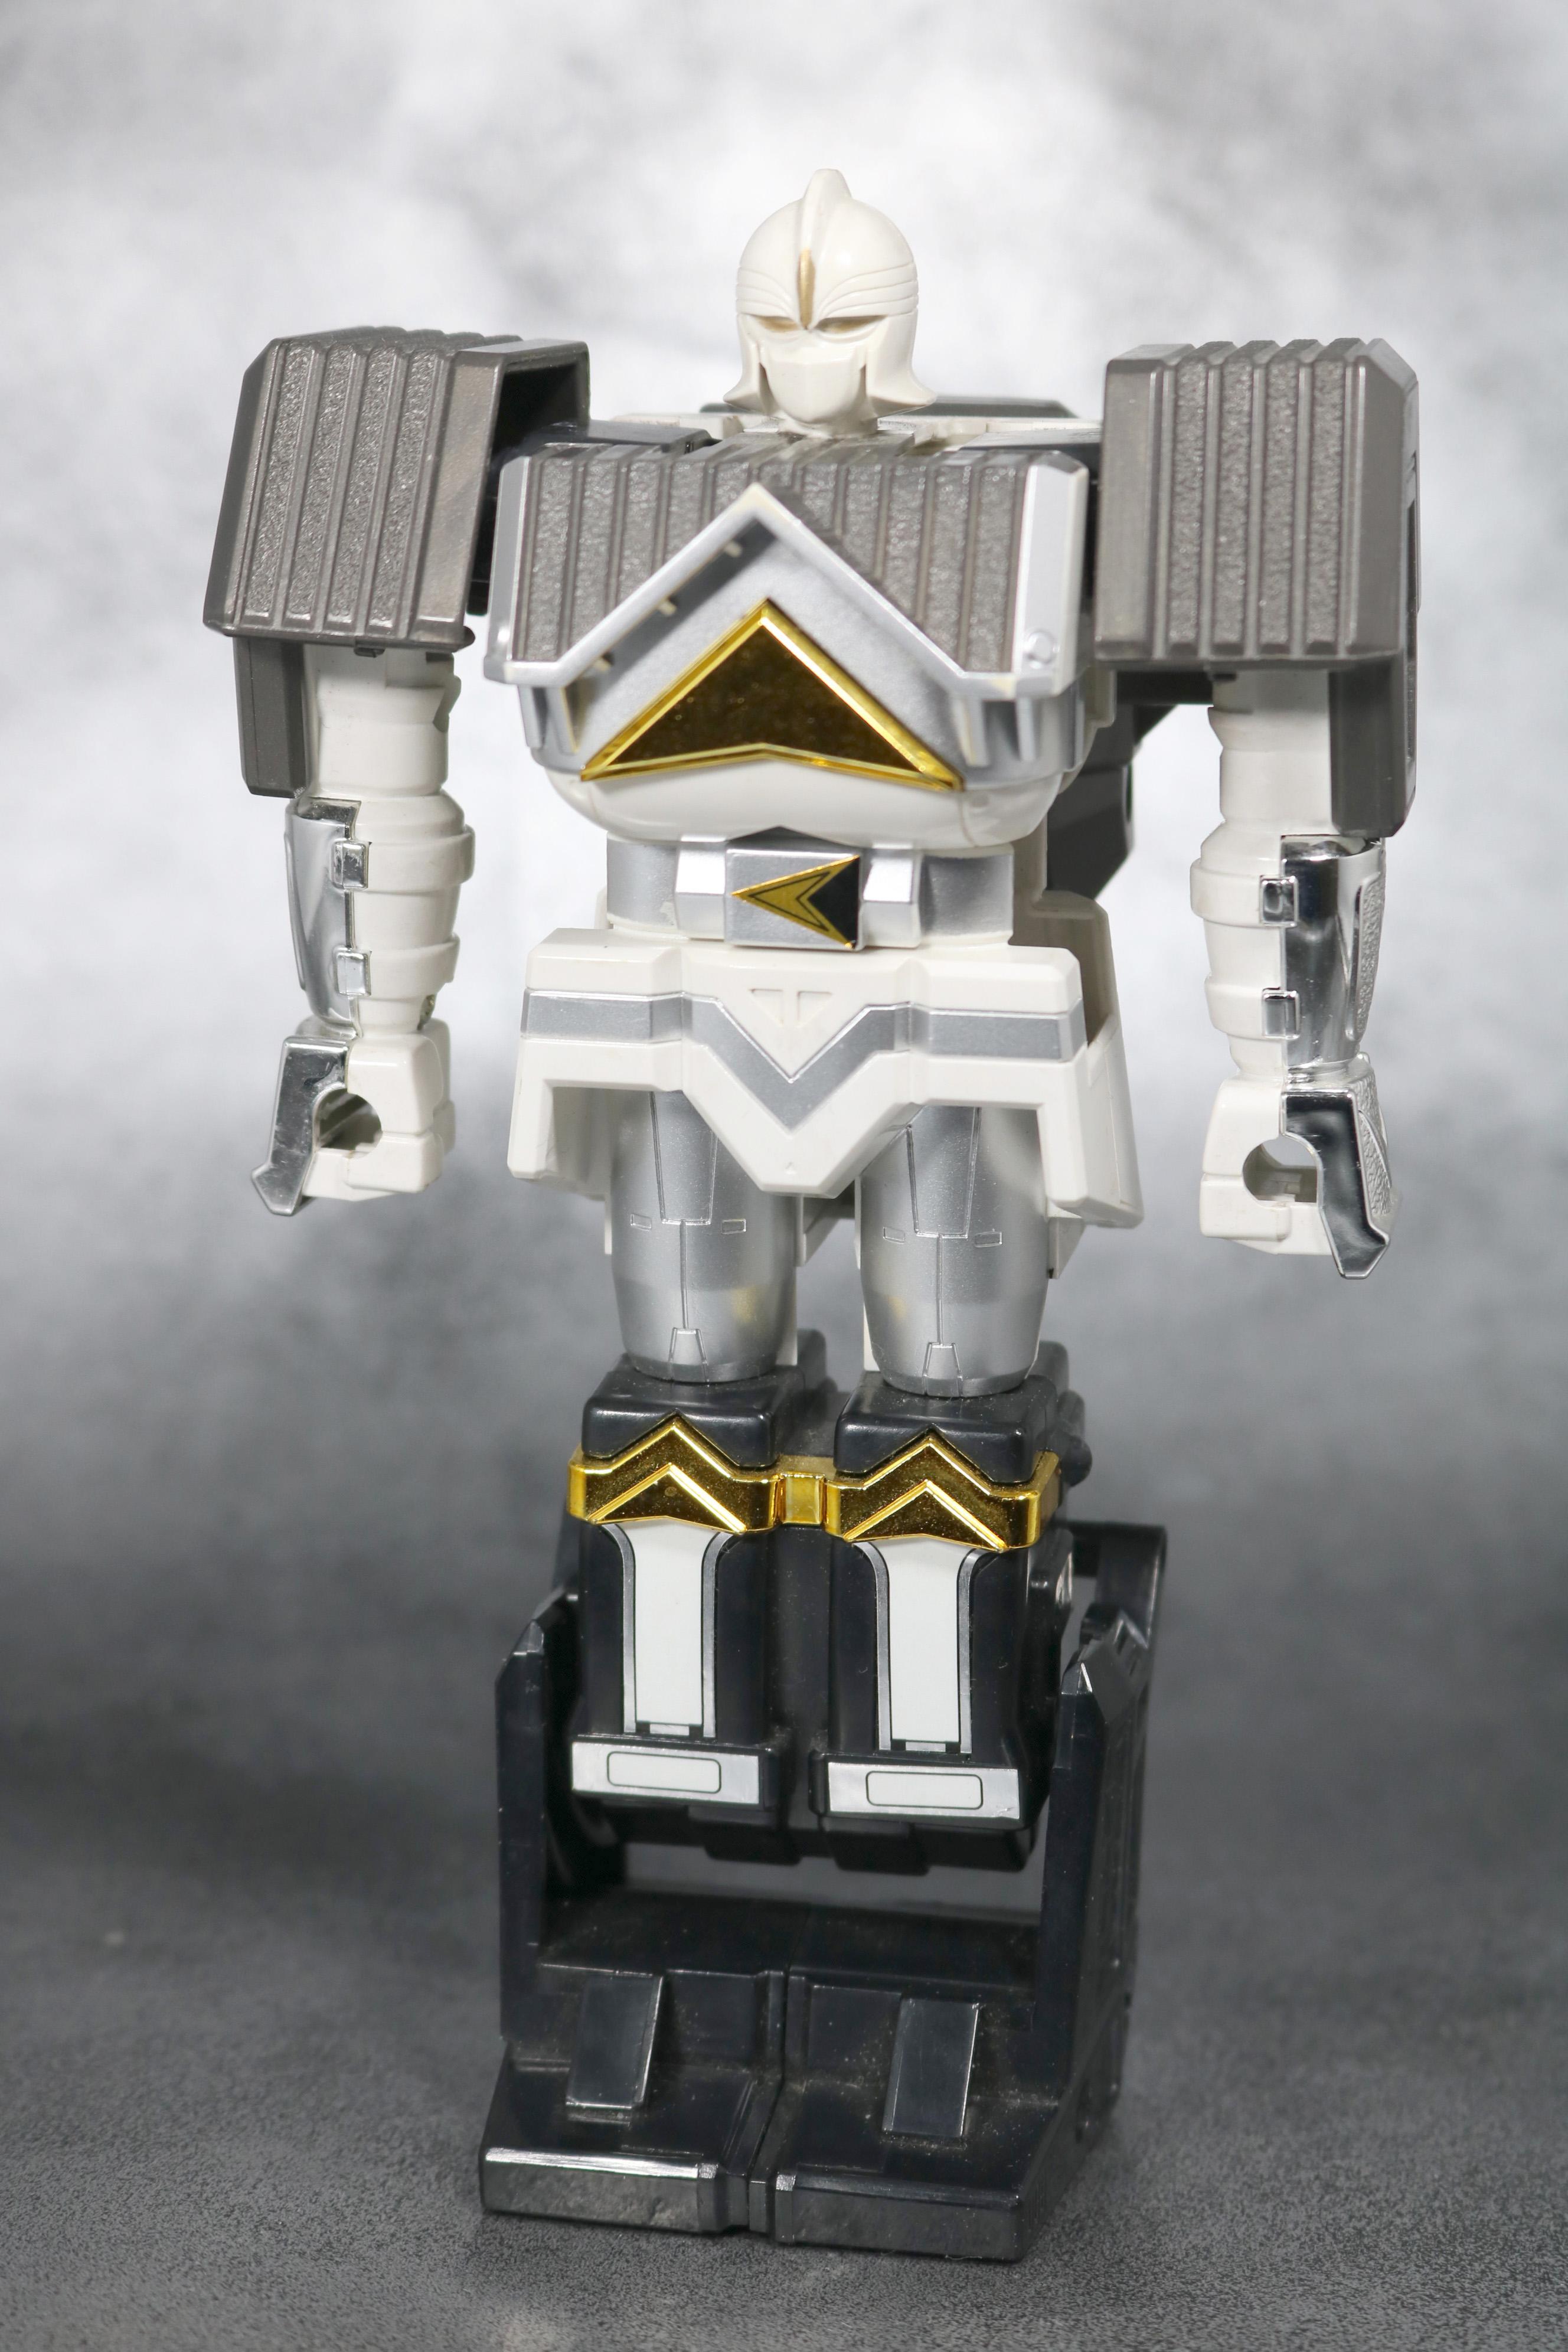 DX 無敵将軍 レビュー ホワイトカーク 全身